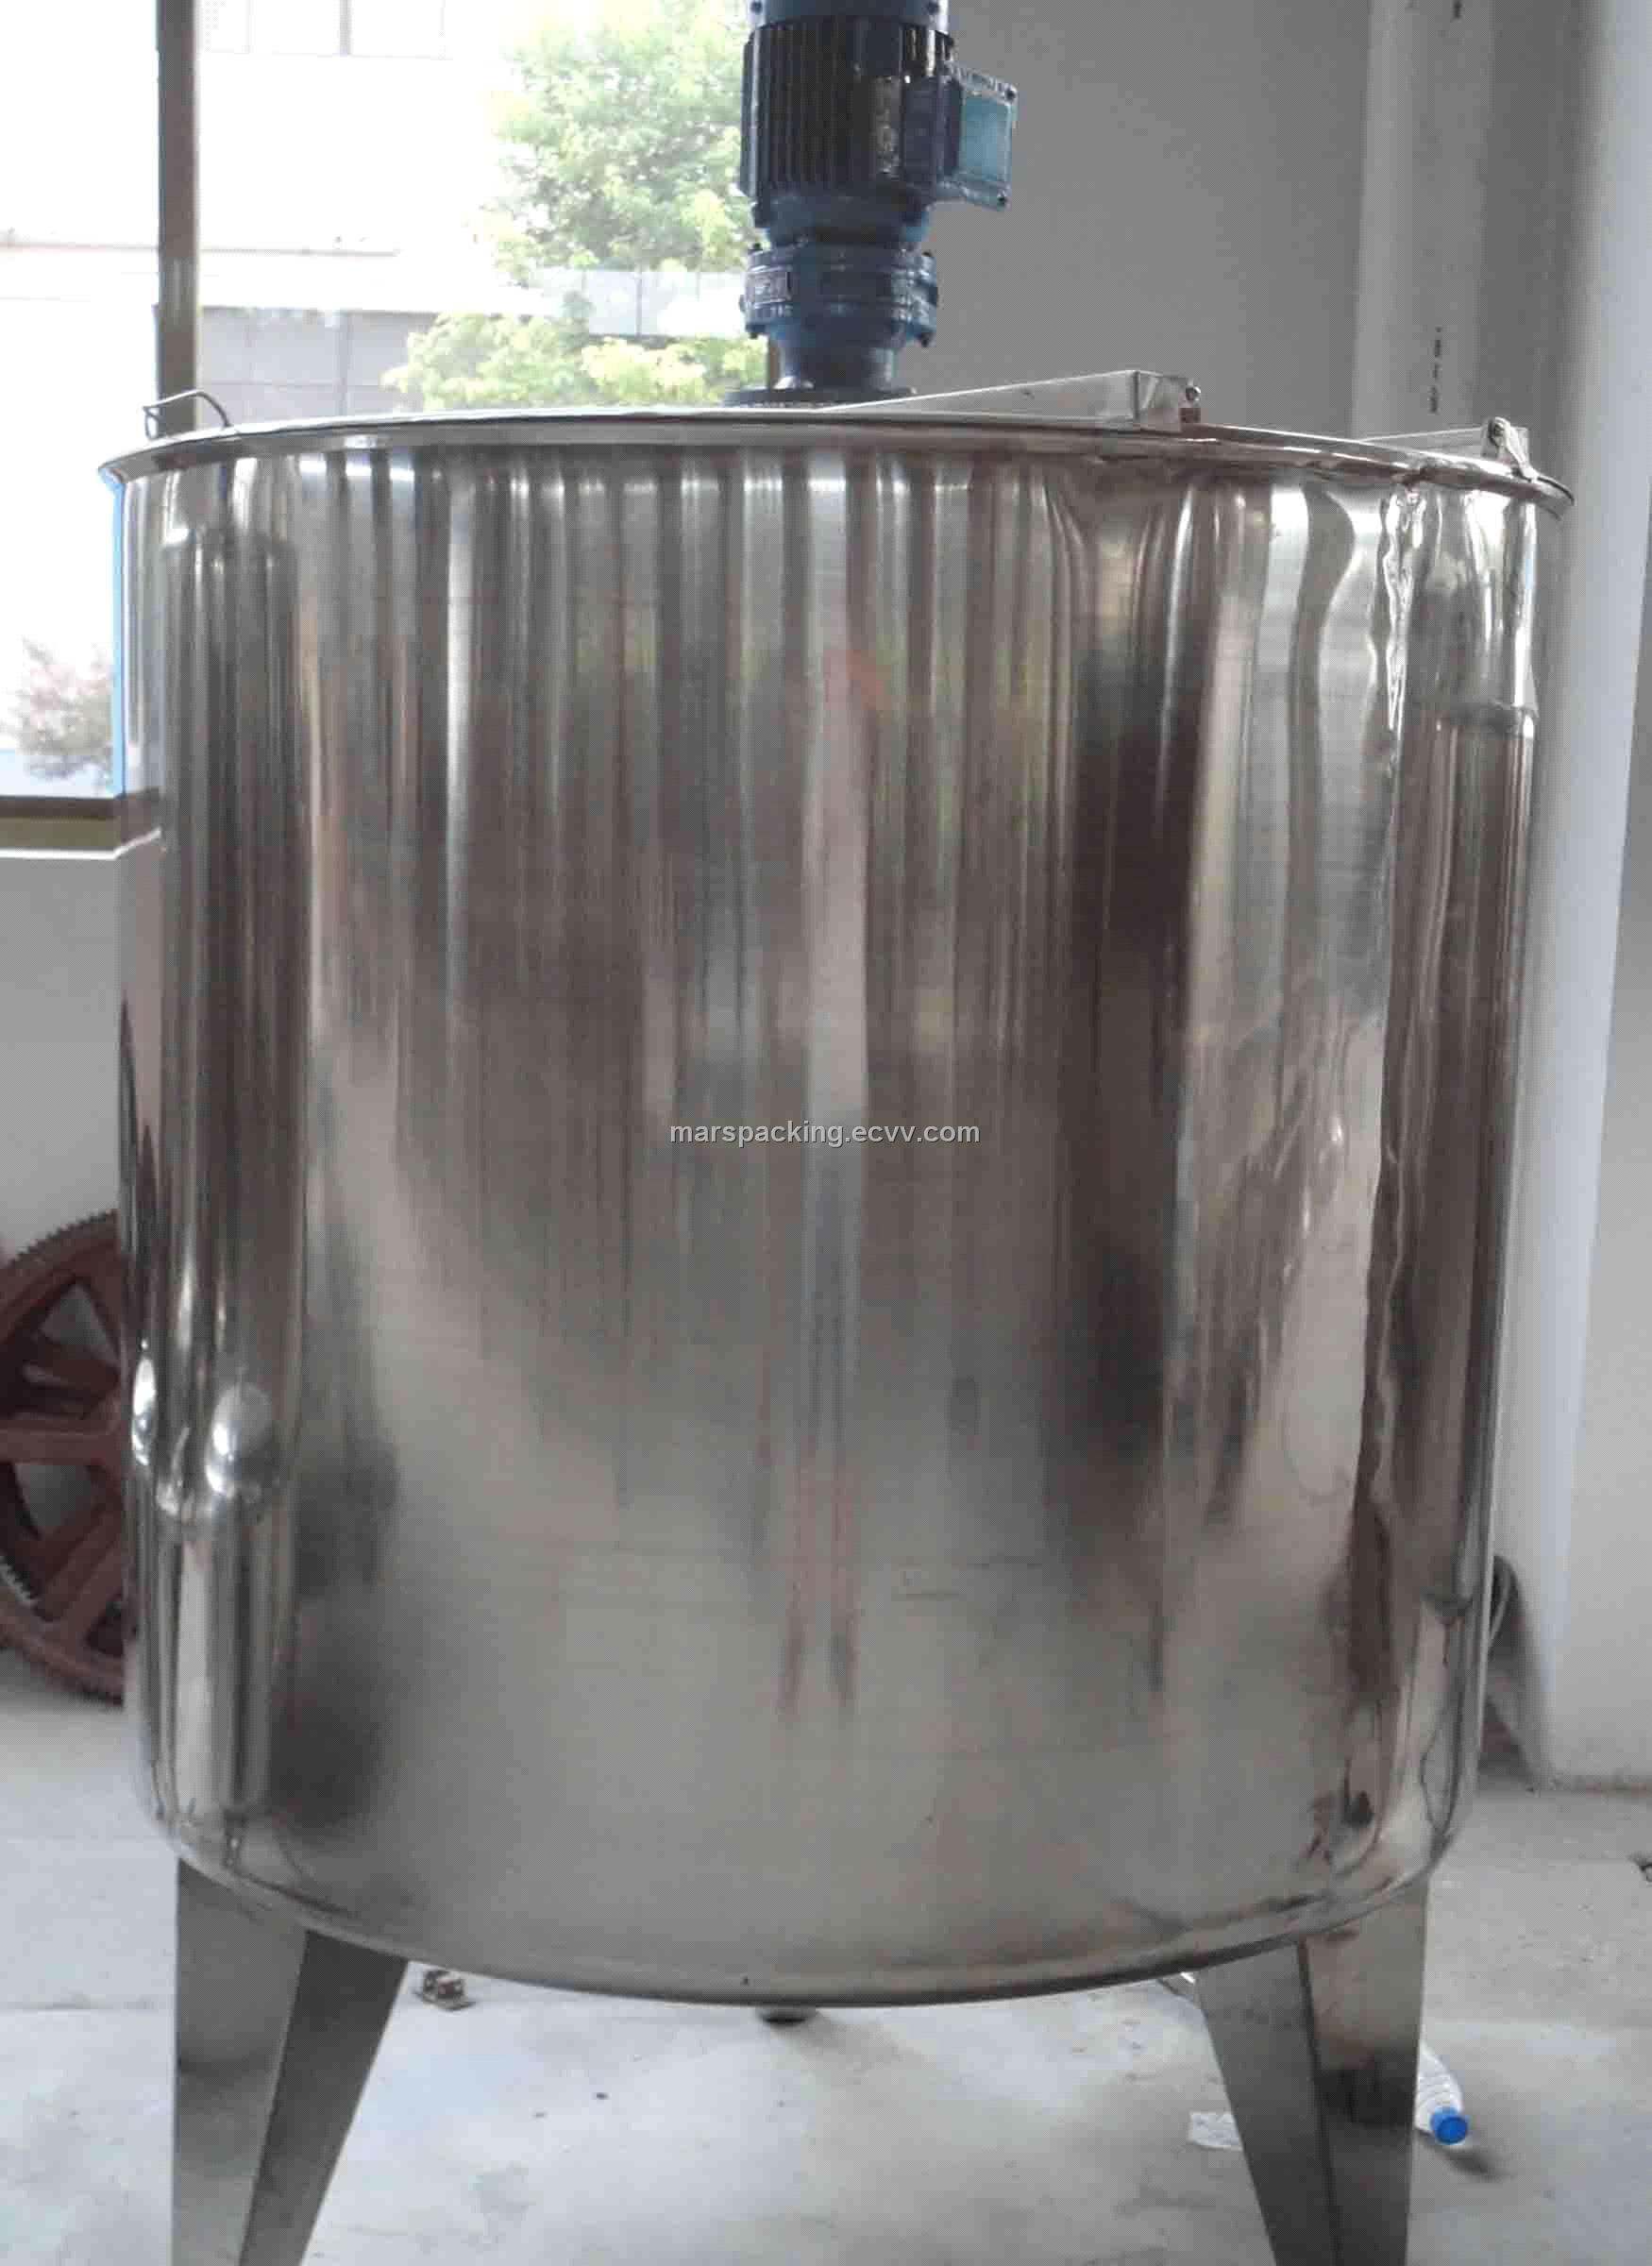 Sugar Mixing Storage Tank Purchasing Souring Agent Ecvv